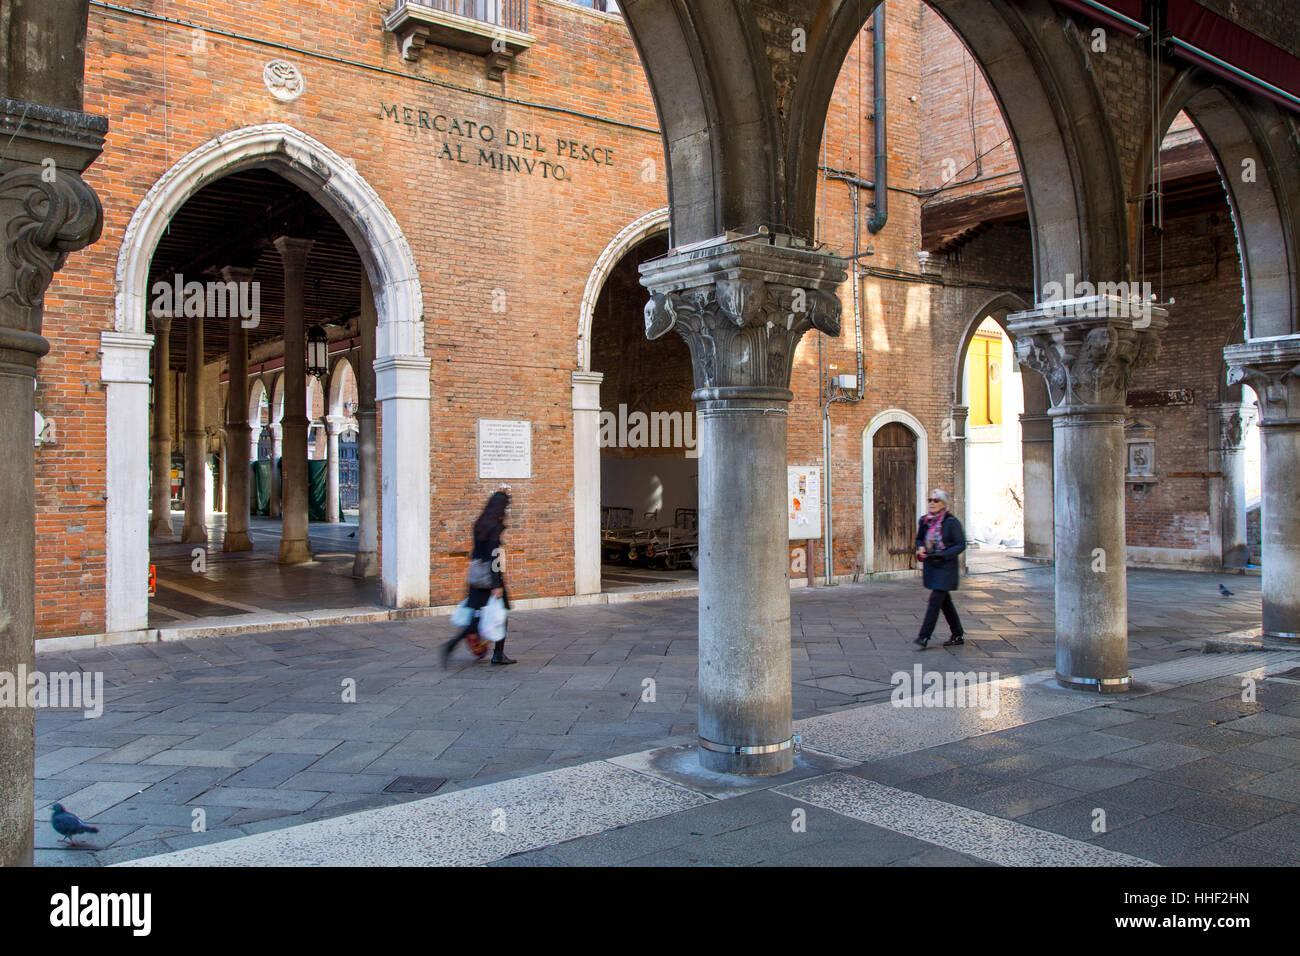 Mercato del Pesce - historic Rialto Fish Market, Venice, Veneto, Italy - Stock Image